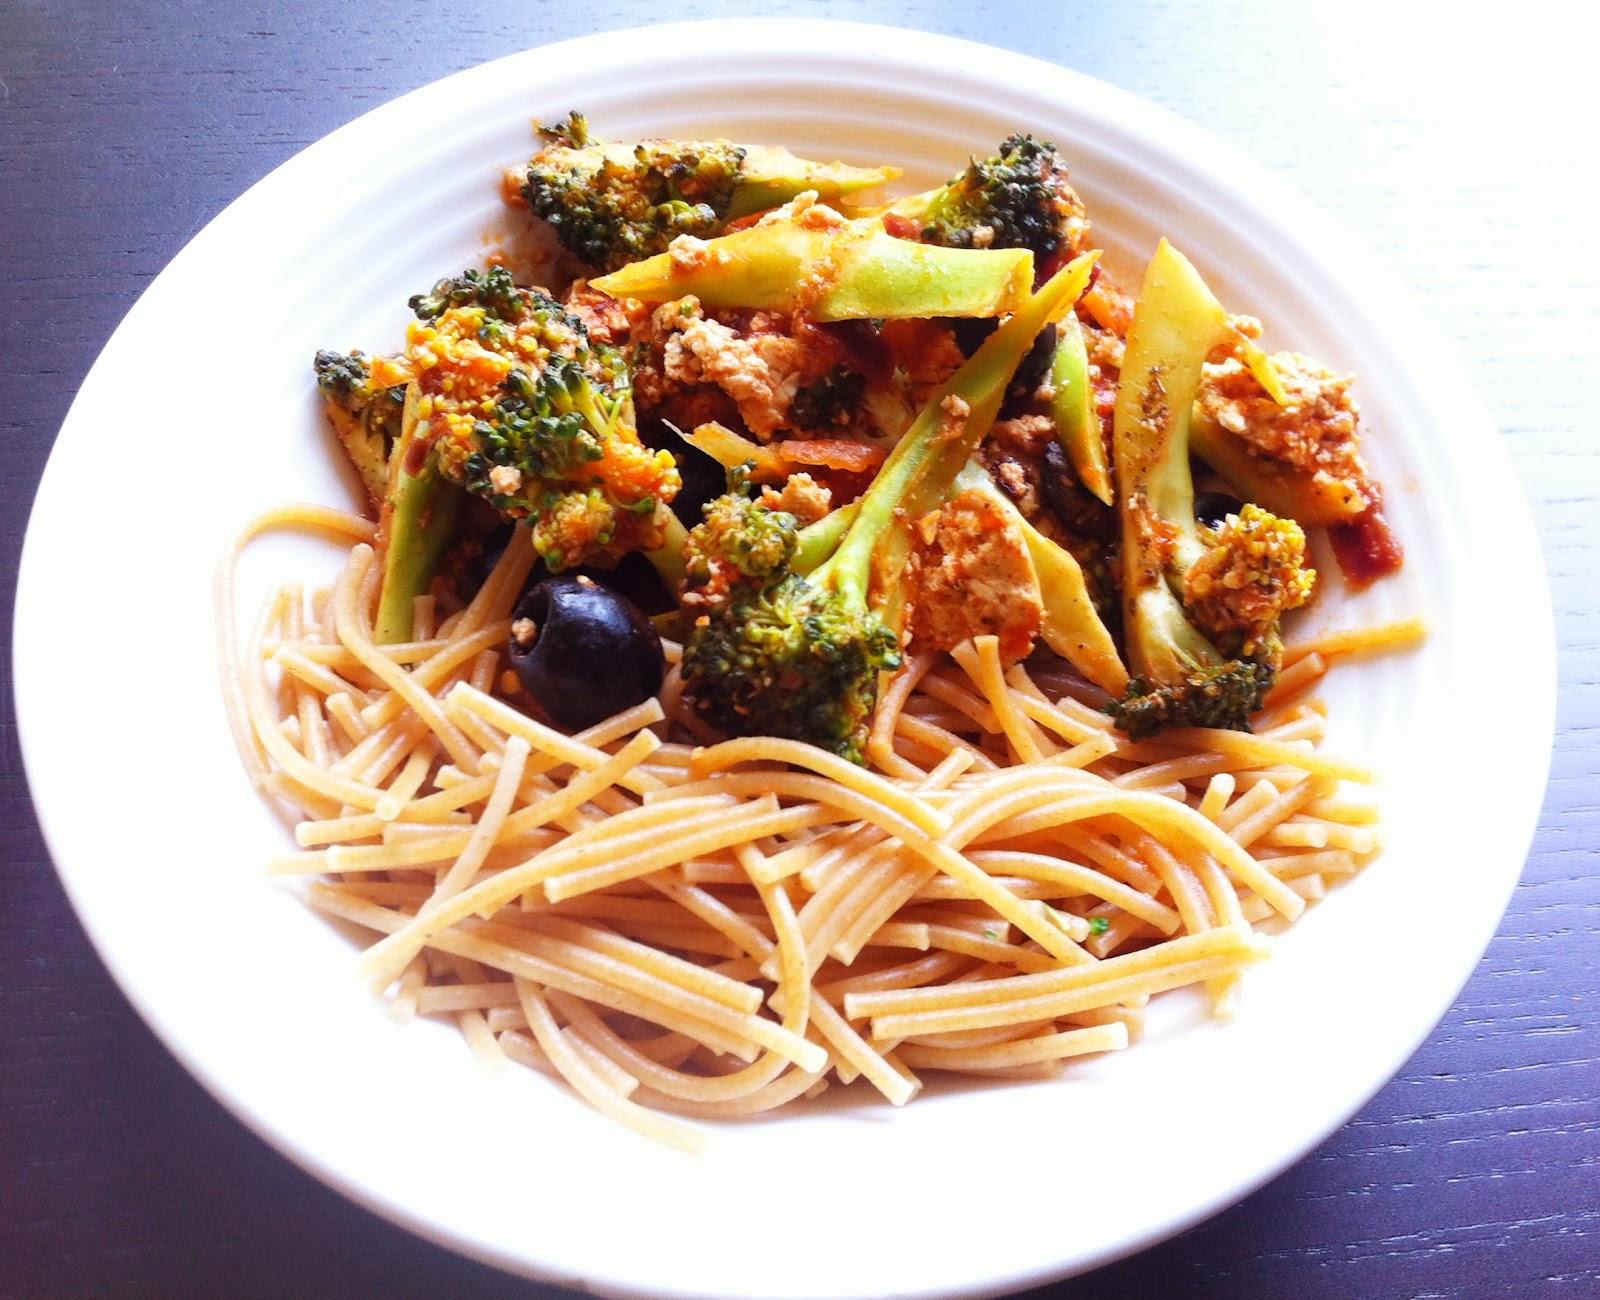 De plantaardige keuken: pasta met broccoli & kruidentofu